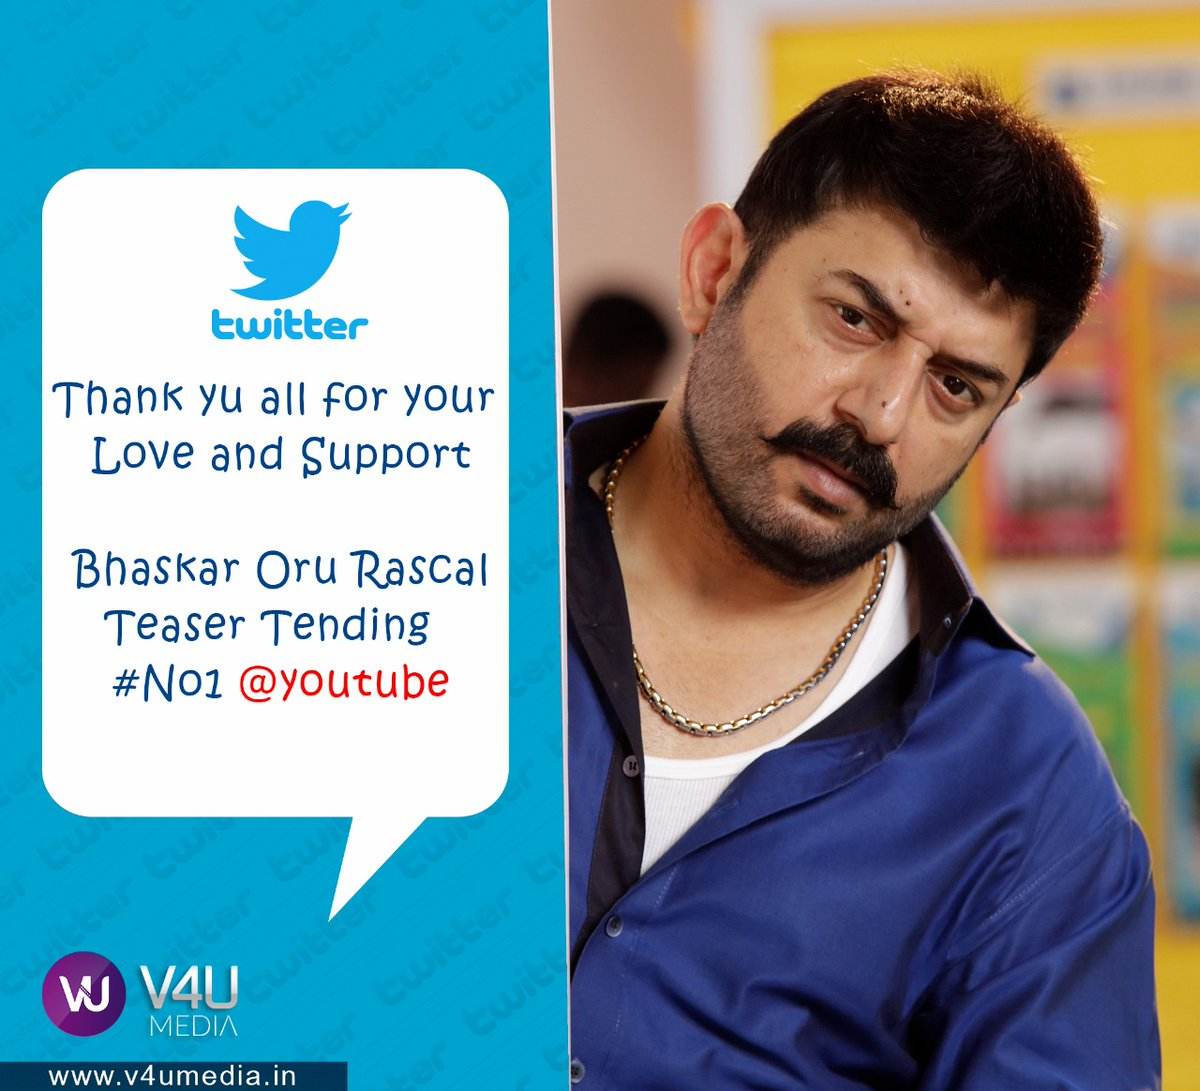 #BaskarOruRascal Teaser trending on No.1 on @YouTube @thearvindswami @Amala_ams @AmrishRocks1 @NikeshaPatel #Siddique  @RIAZtheboss <br>http://pic.twitter.com/w2hUciEJ33